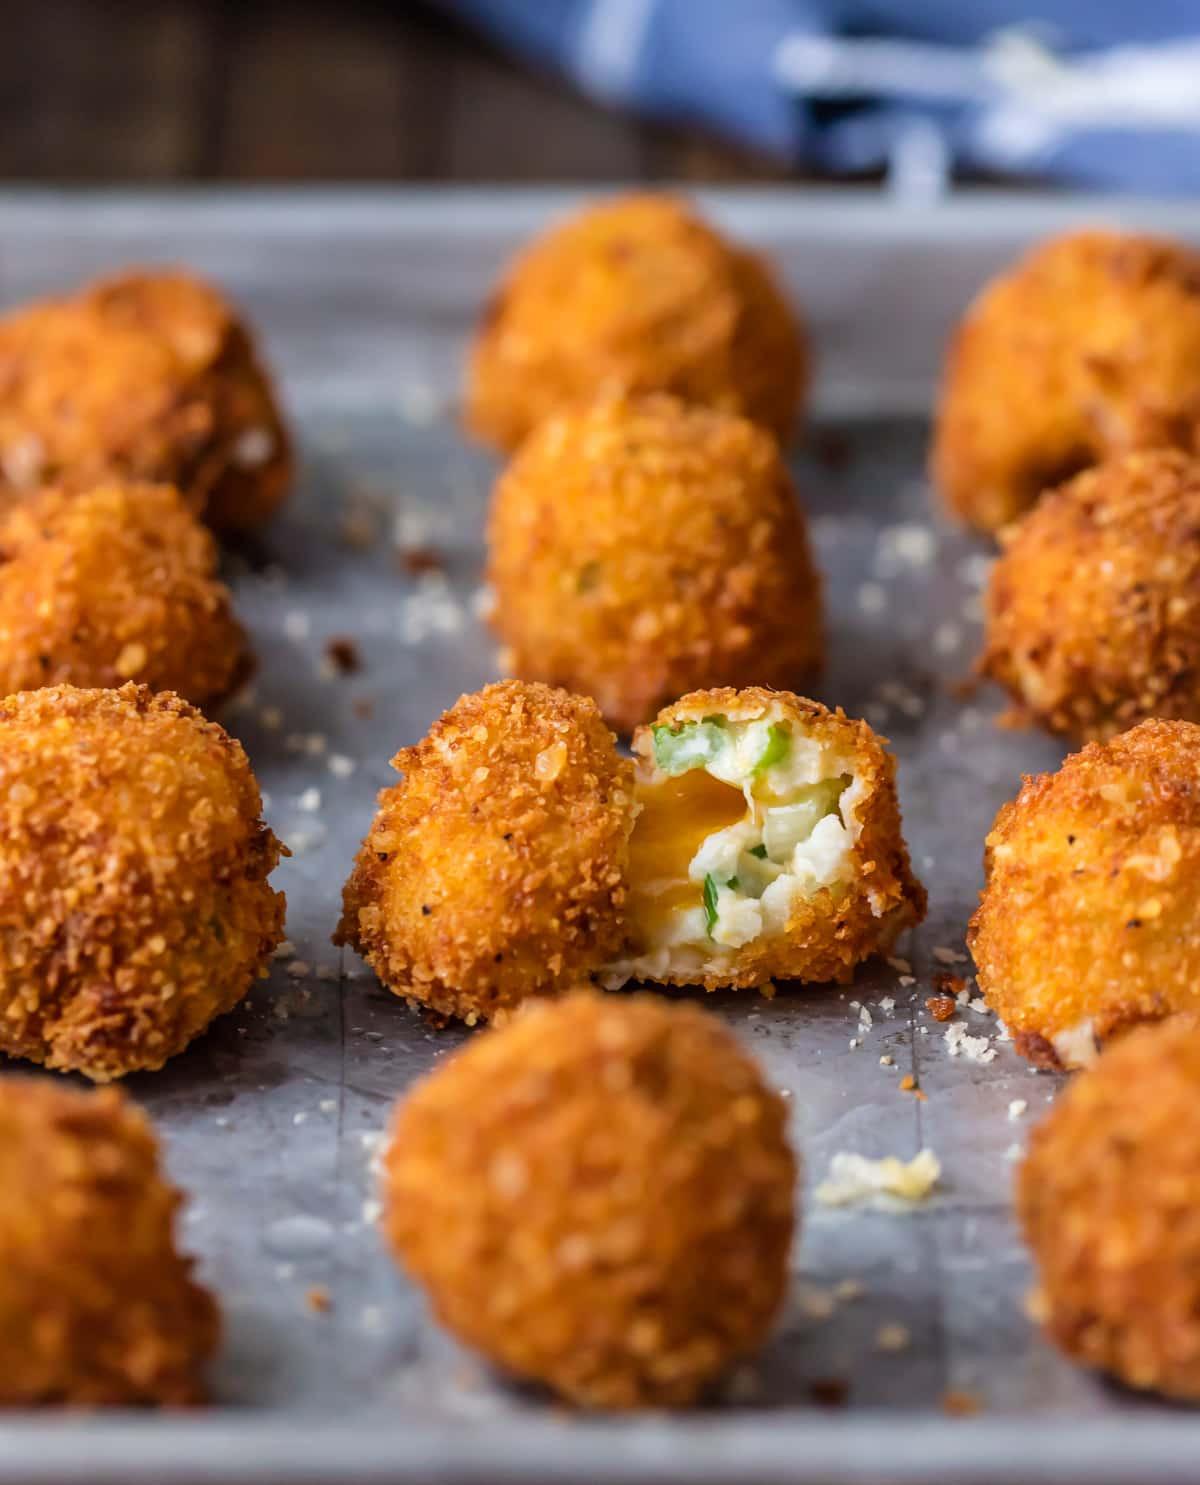 Deep Fried Mashed Potatoes  Fried Mashed Potato Balls Cheesy Loaded Mashed Potato